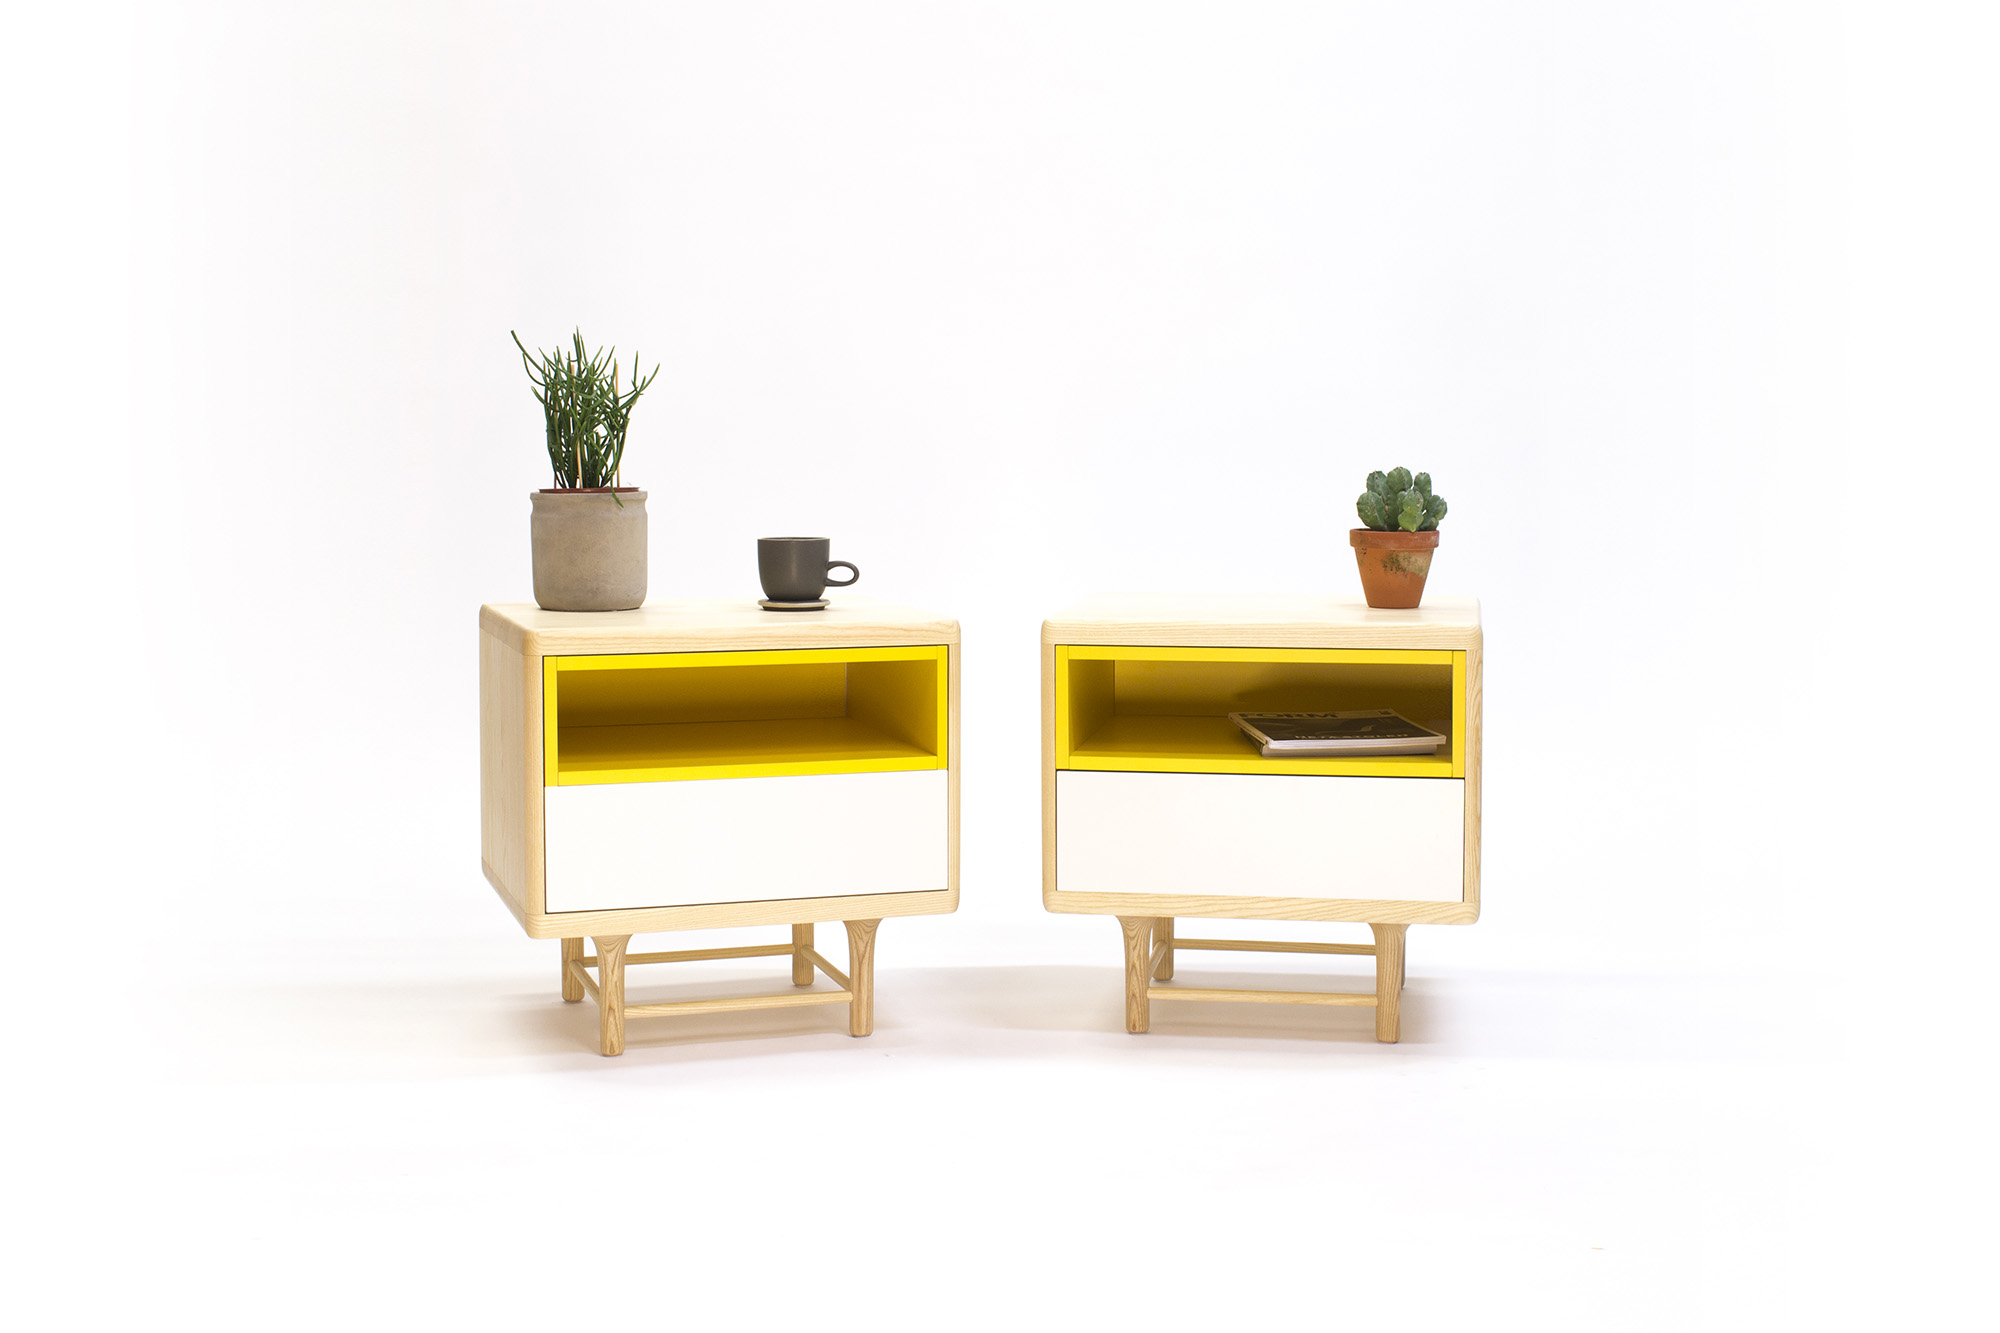 Minimal Scandinavian Furniture By Designer Carlos Jim 233 Nez